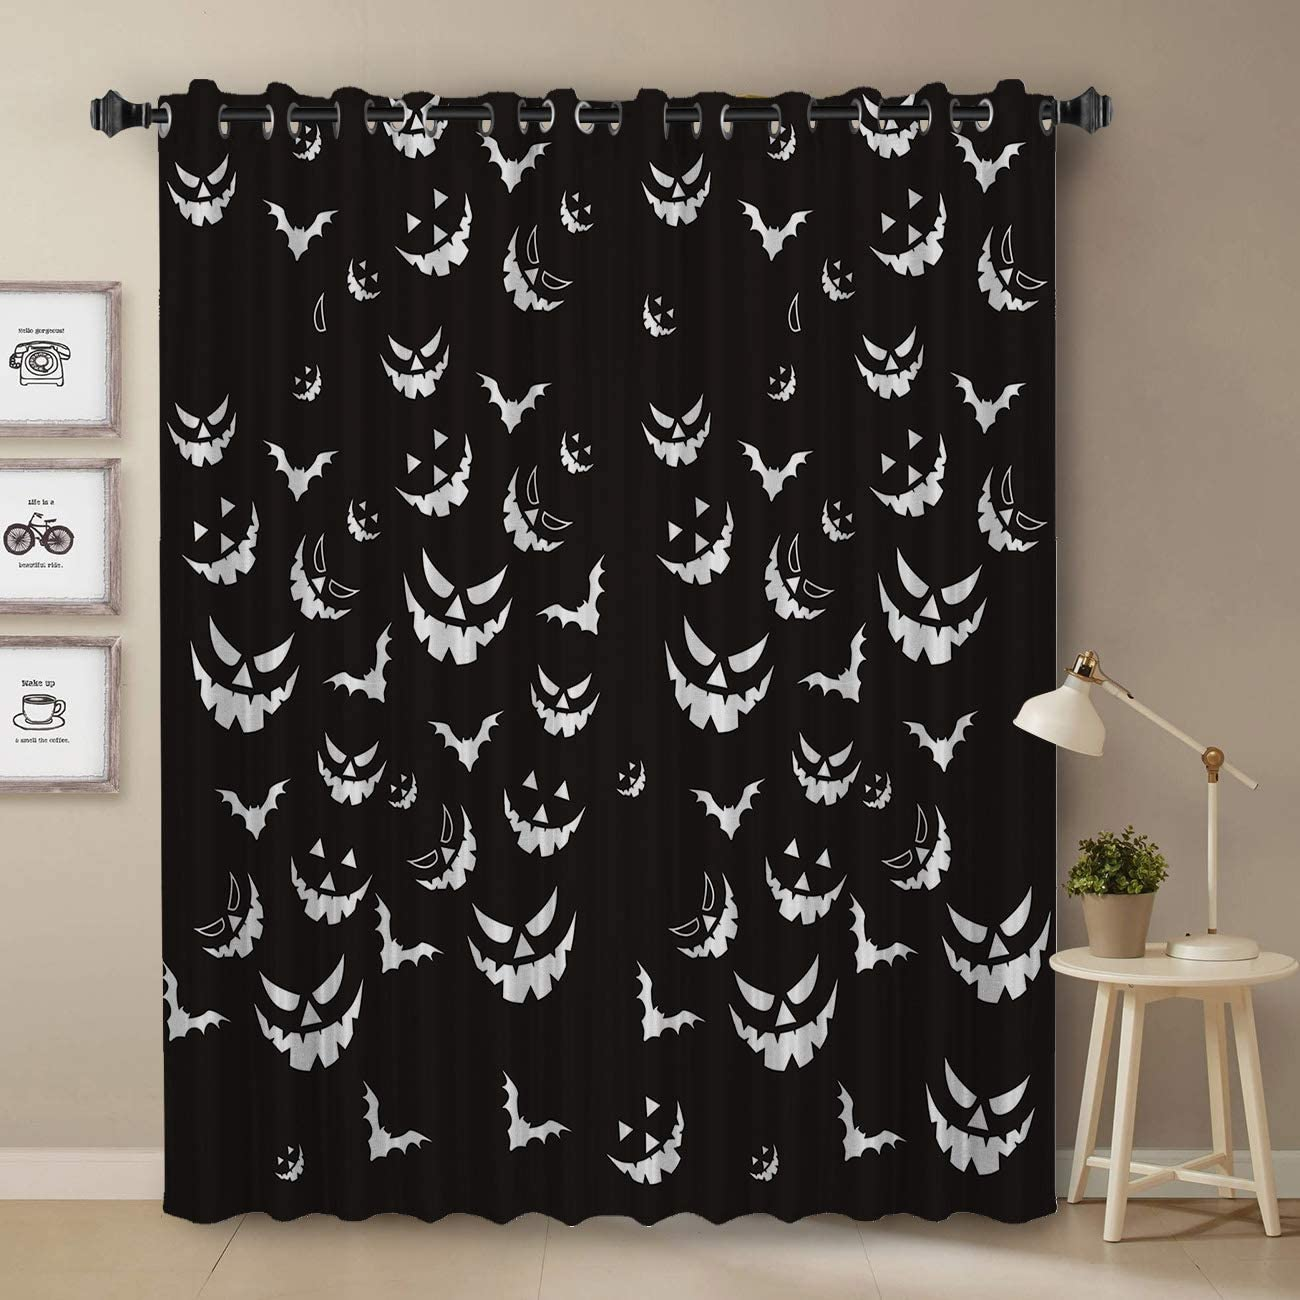 Darkening Blackout Curtain for Bedroom – 96 inch Long Window Treatment Curtain Drapes Modern Art Design for Living Room – Halloween Pumpkin Bat Black and White Pattern Decoration Design